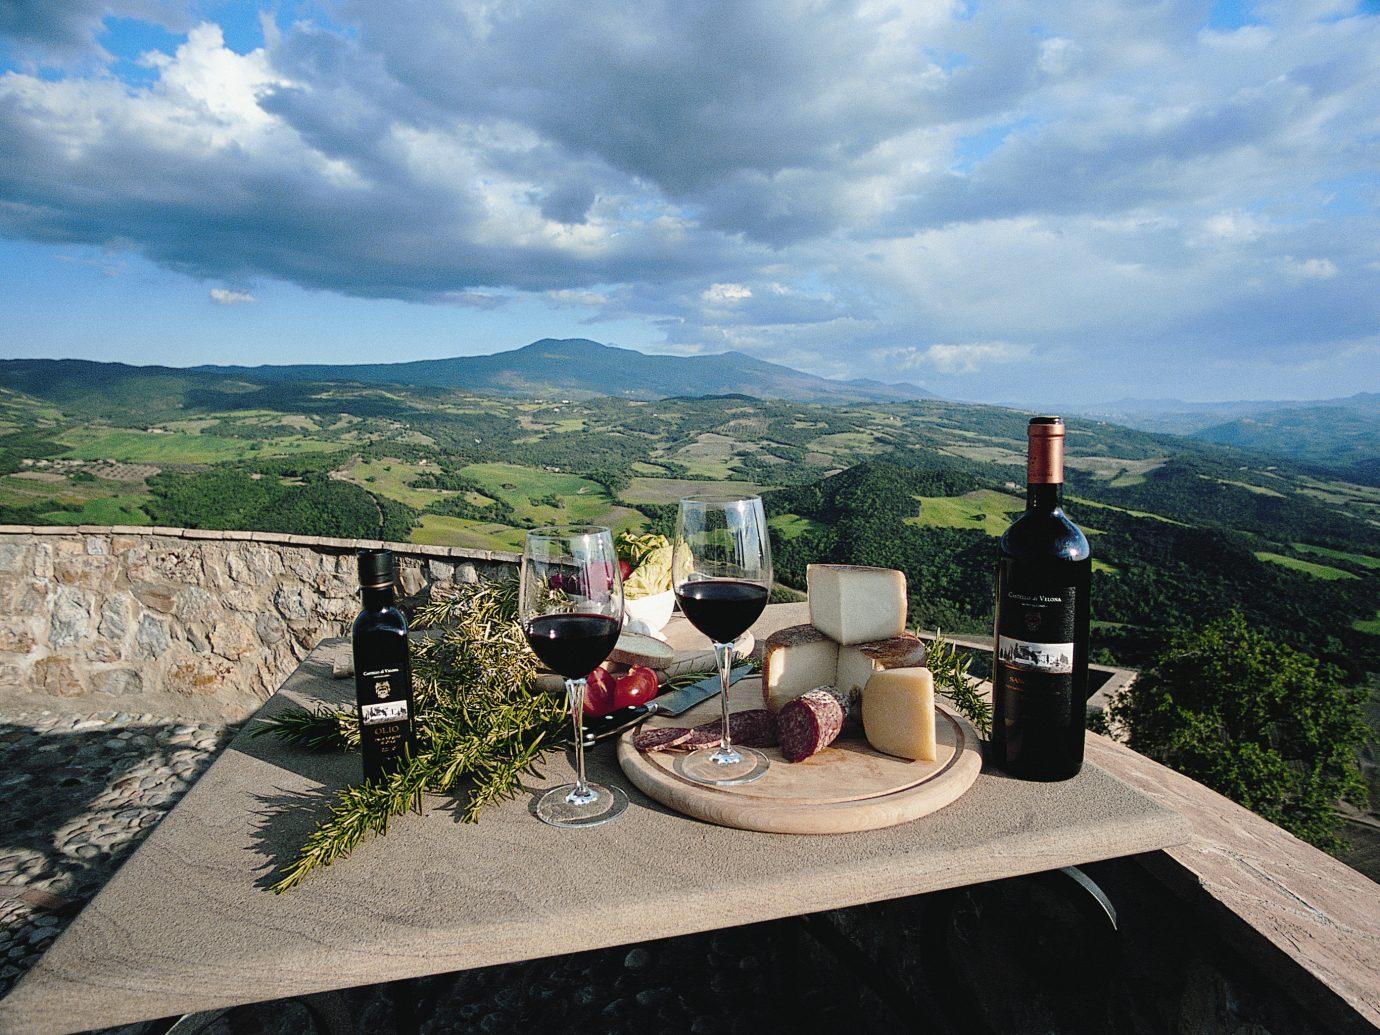 Country Drink Grounds Honeymoon Italy Luxury Romance Romantic Scenic views Trip Ideas sky mountain outdoor ground vacation tourism mountain range estate travel overlooking stone